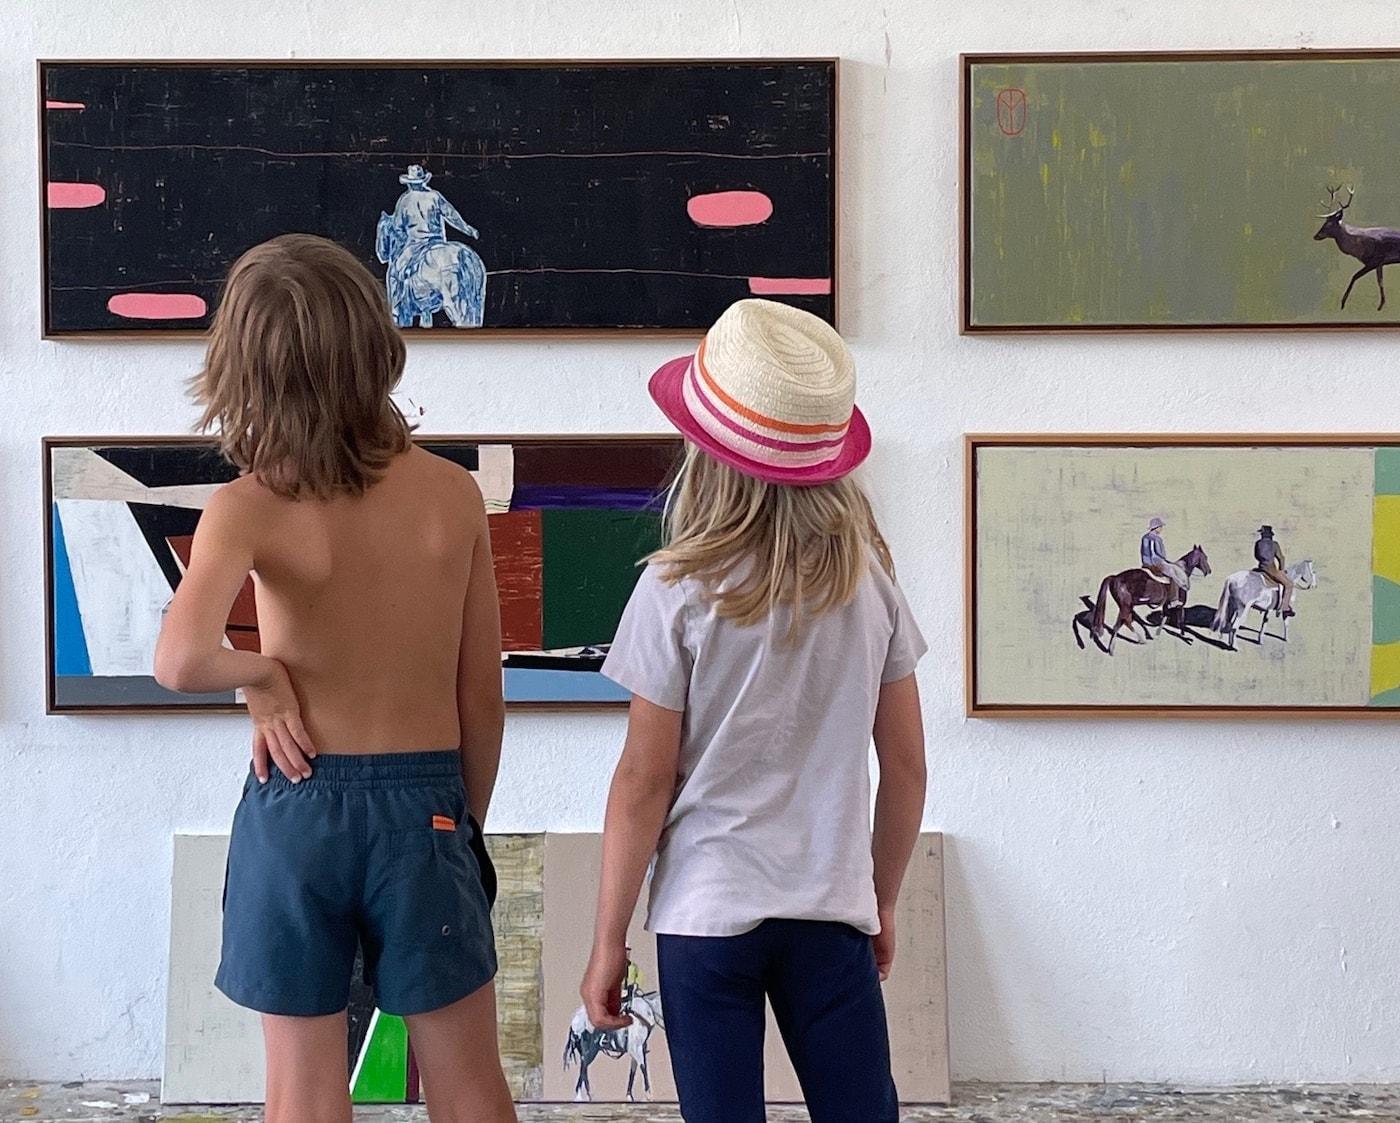 Kunstfestival für Familien mit Kindern in Berlin // HIMBEER